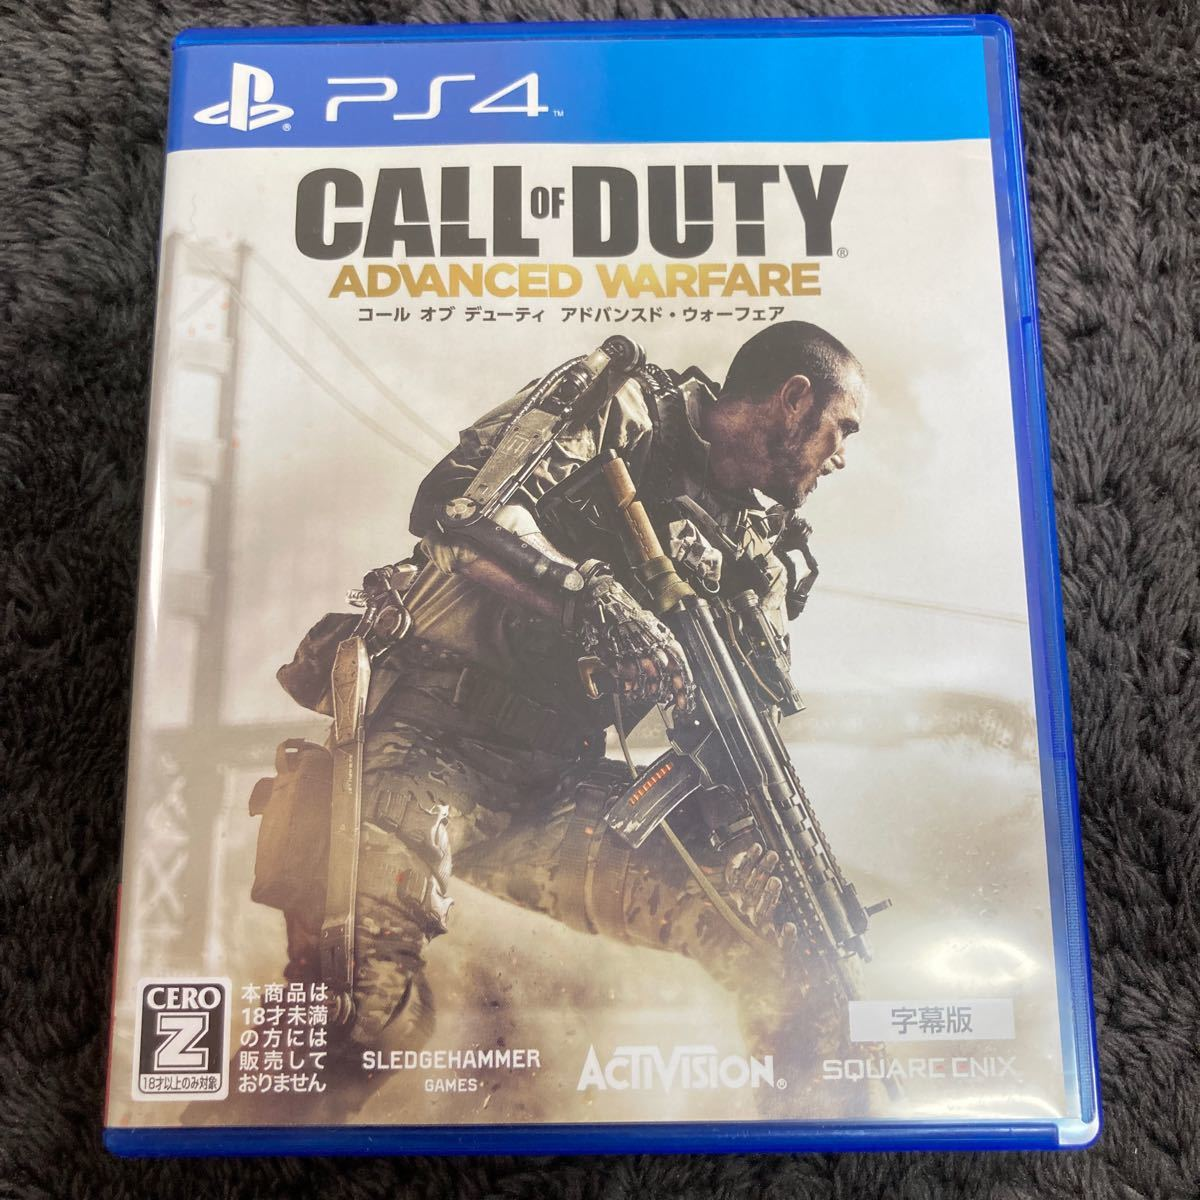 PS4 コールオブデューティアドバンスド・ウォーフェア CALL OF DUTY